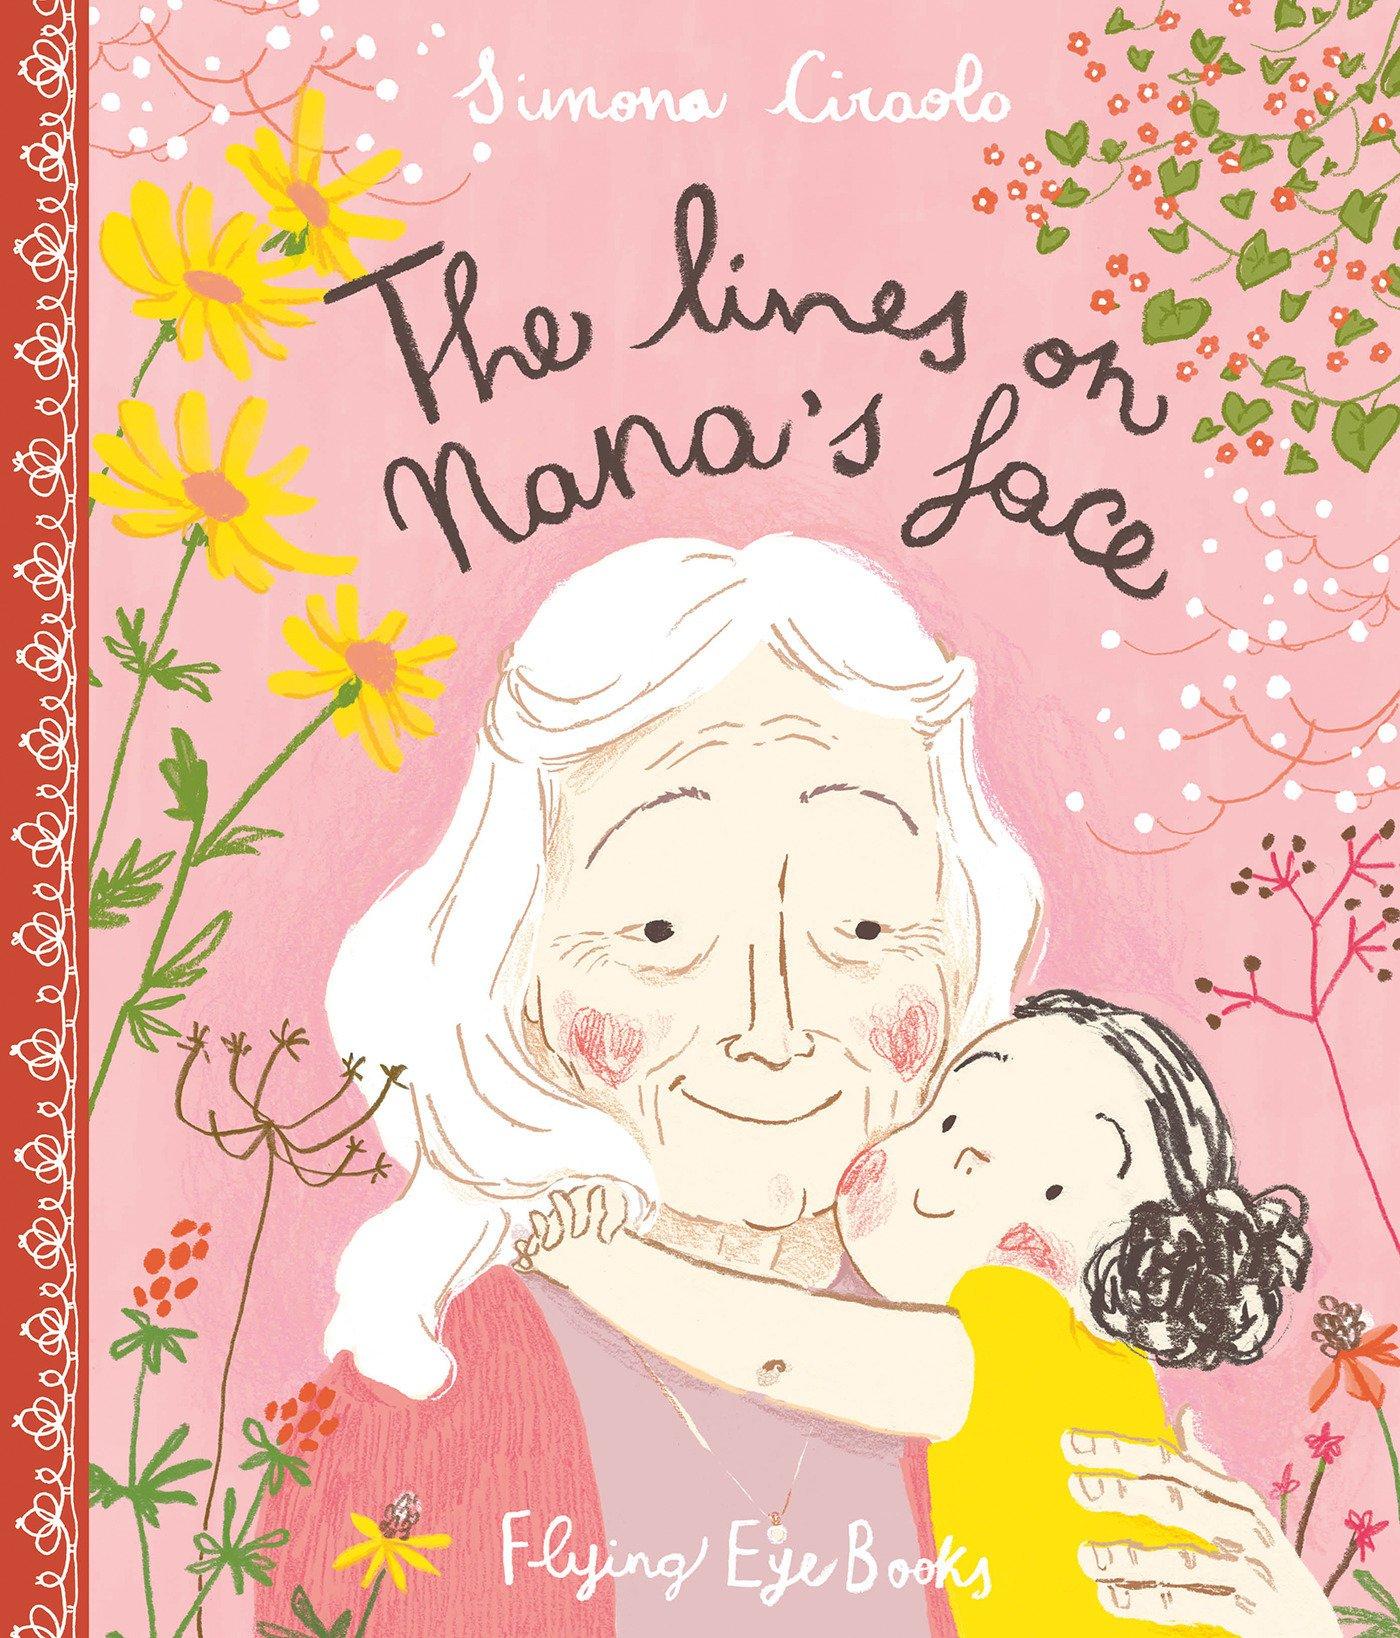 Lines On Nana's Face By Simona Ciraolo